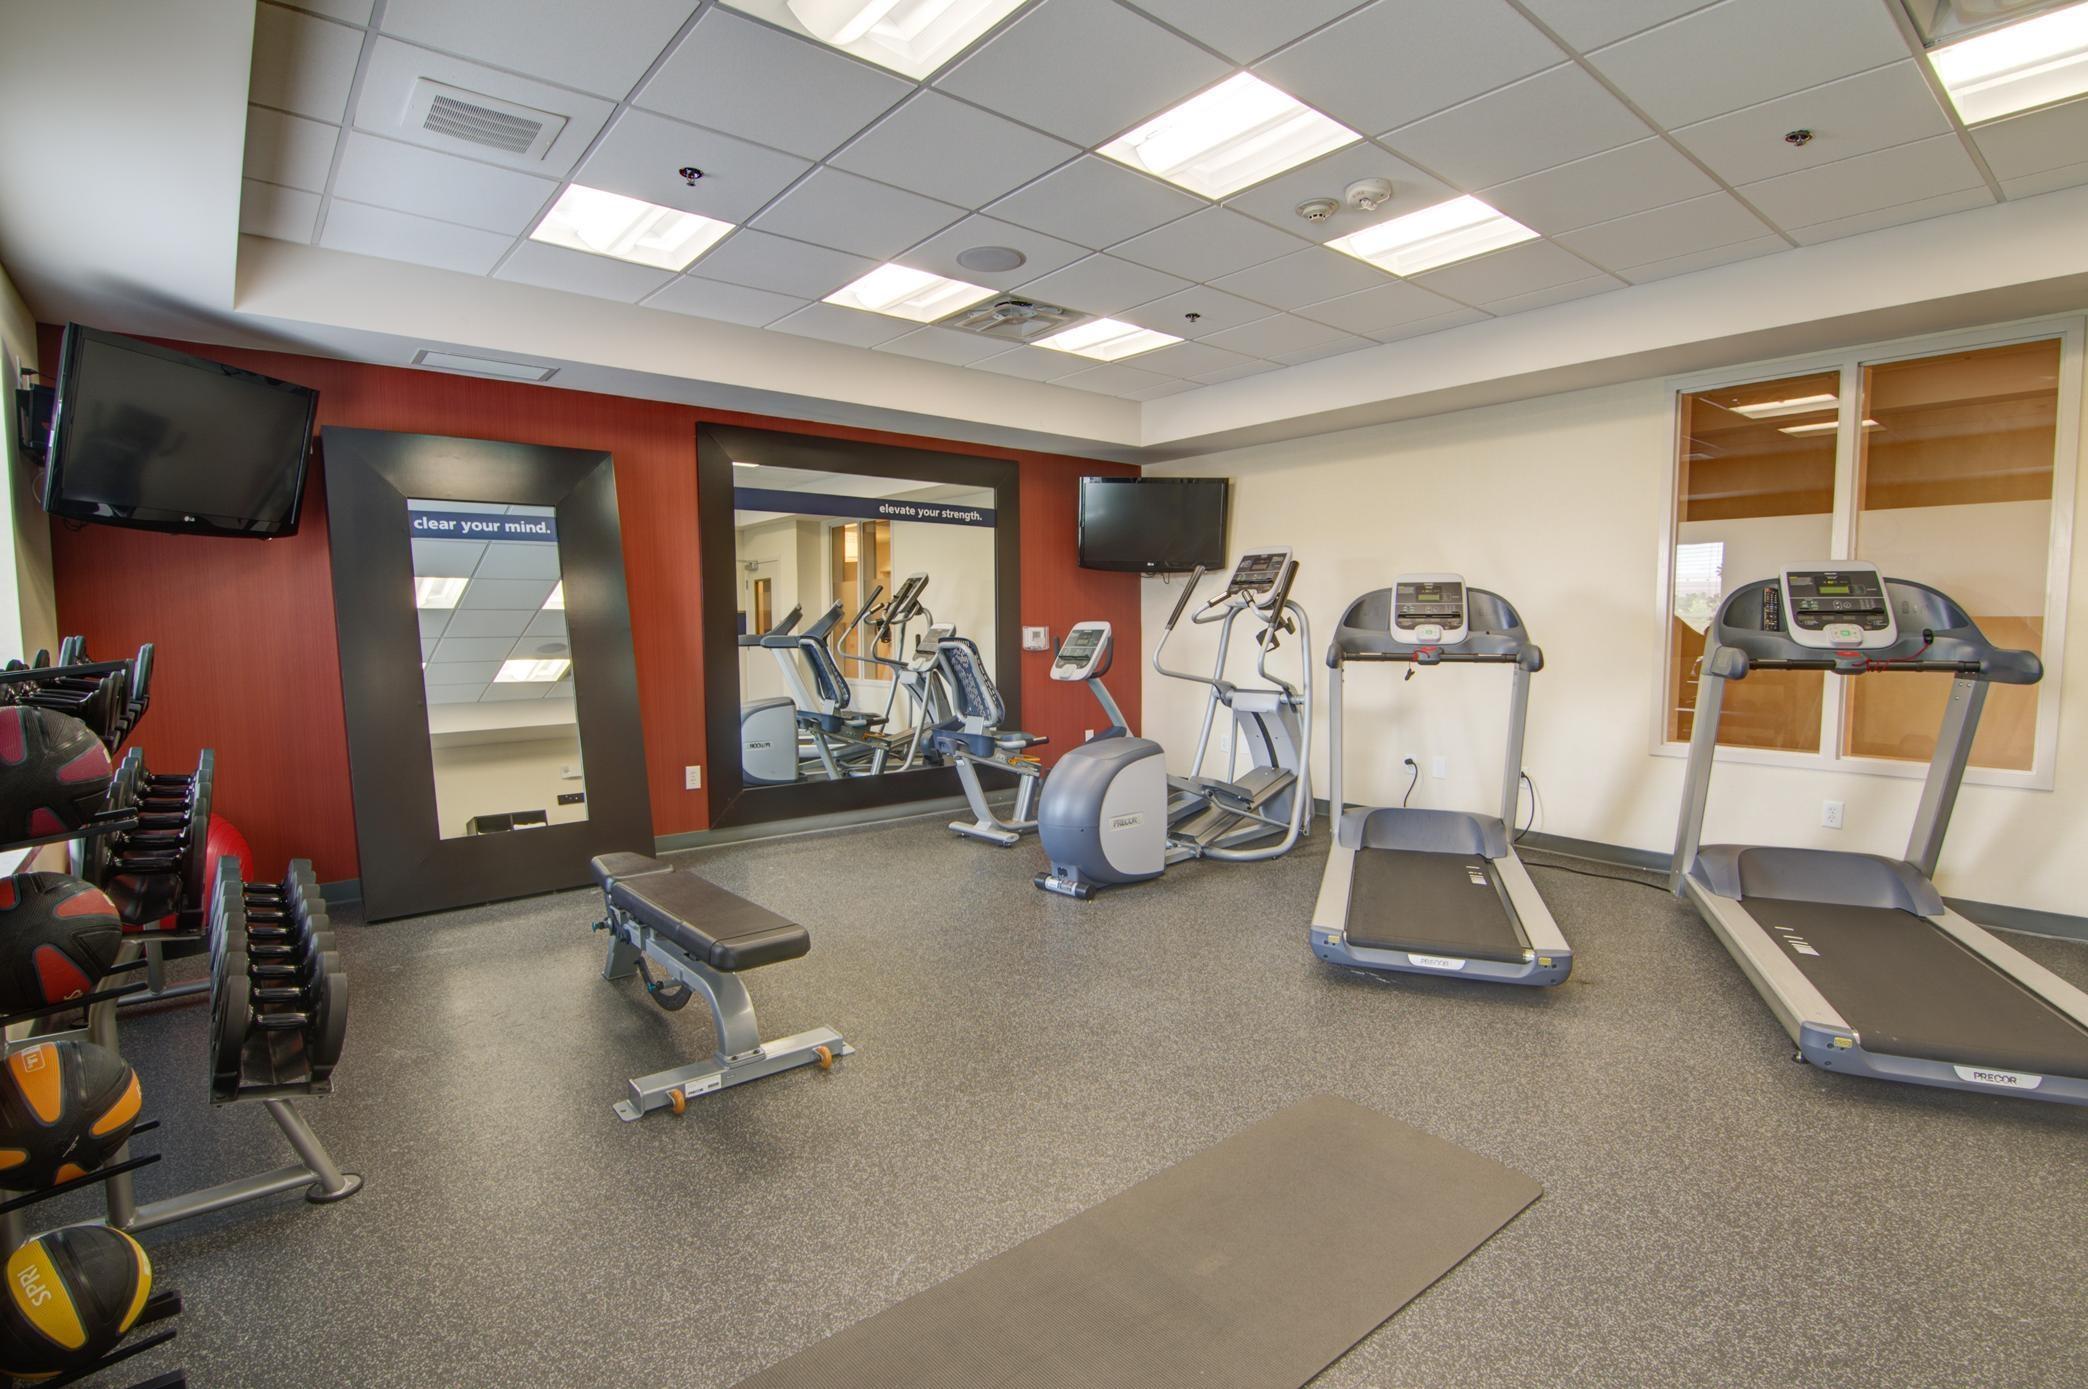 Hampton Inn & Suites Trophy Club - Fort Worth North image 8